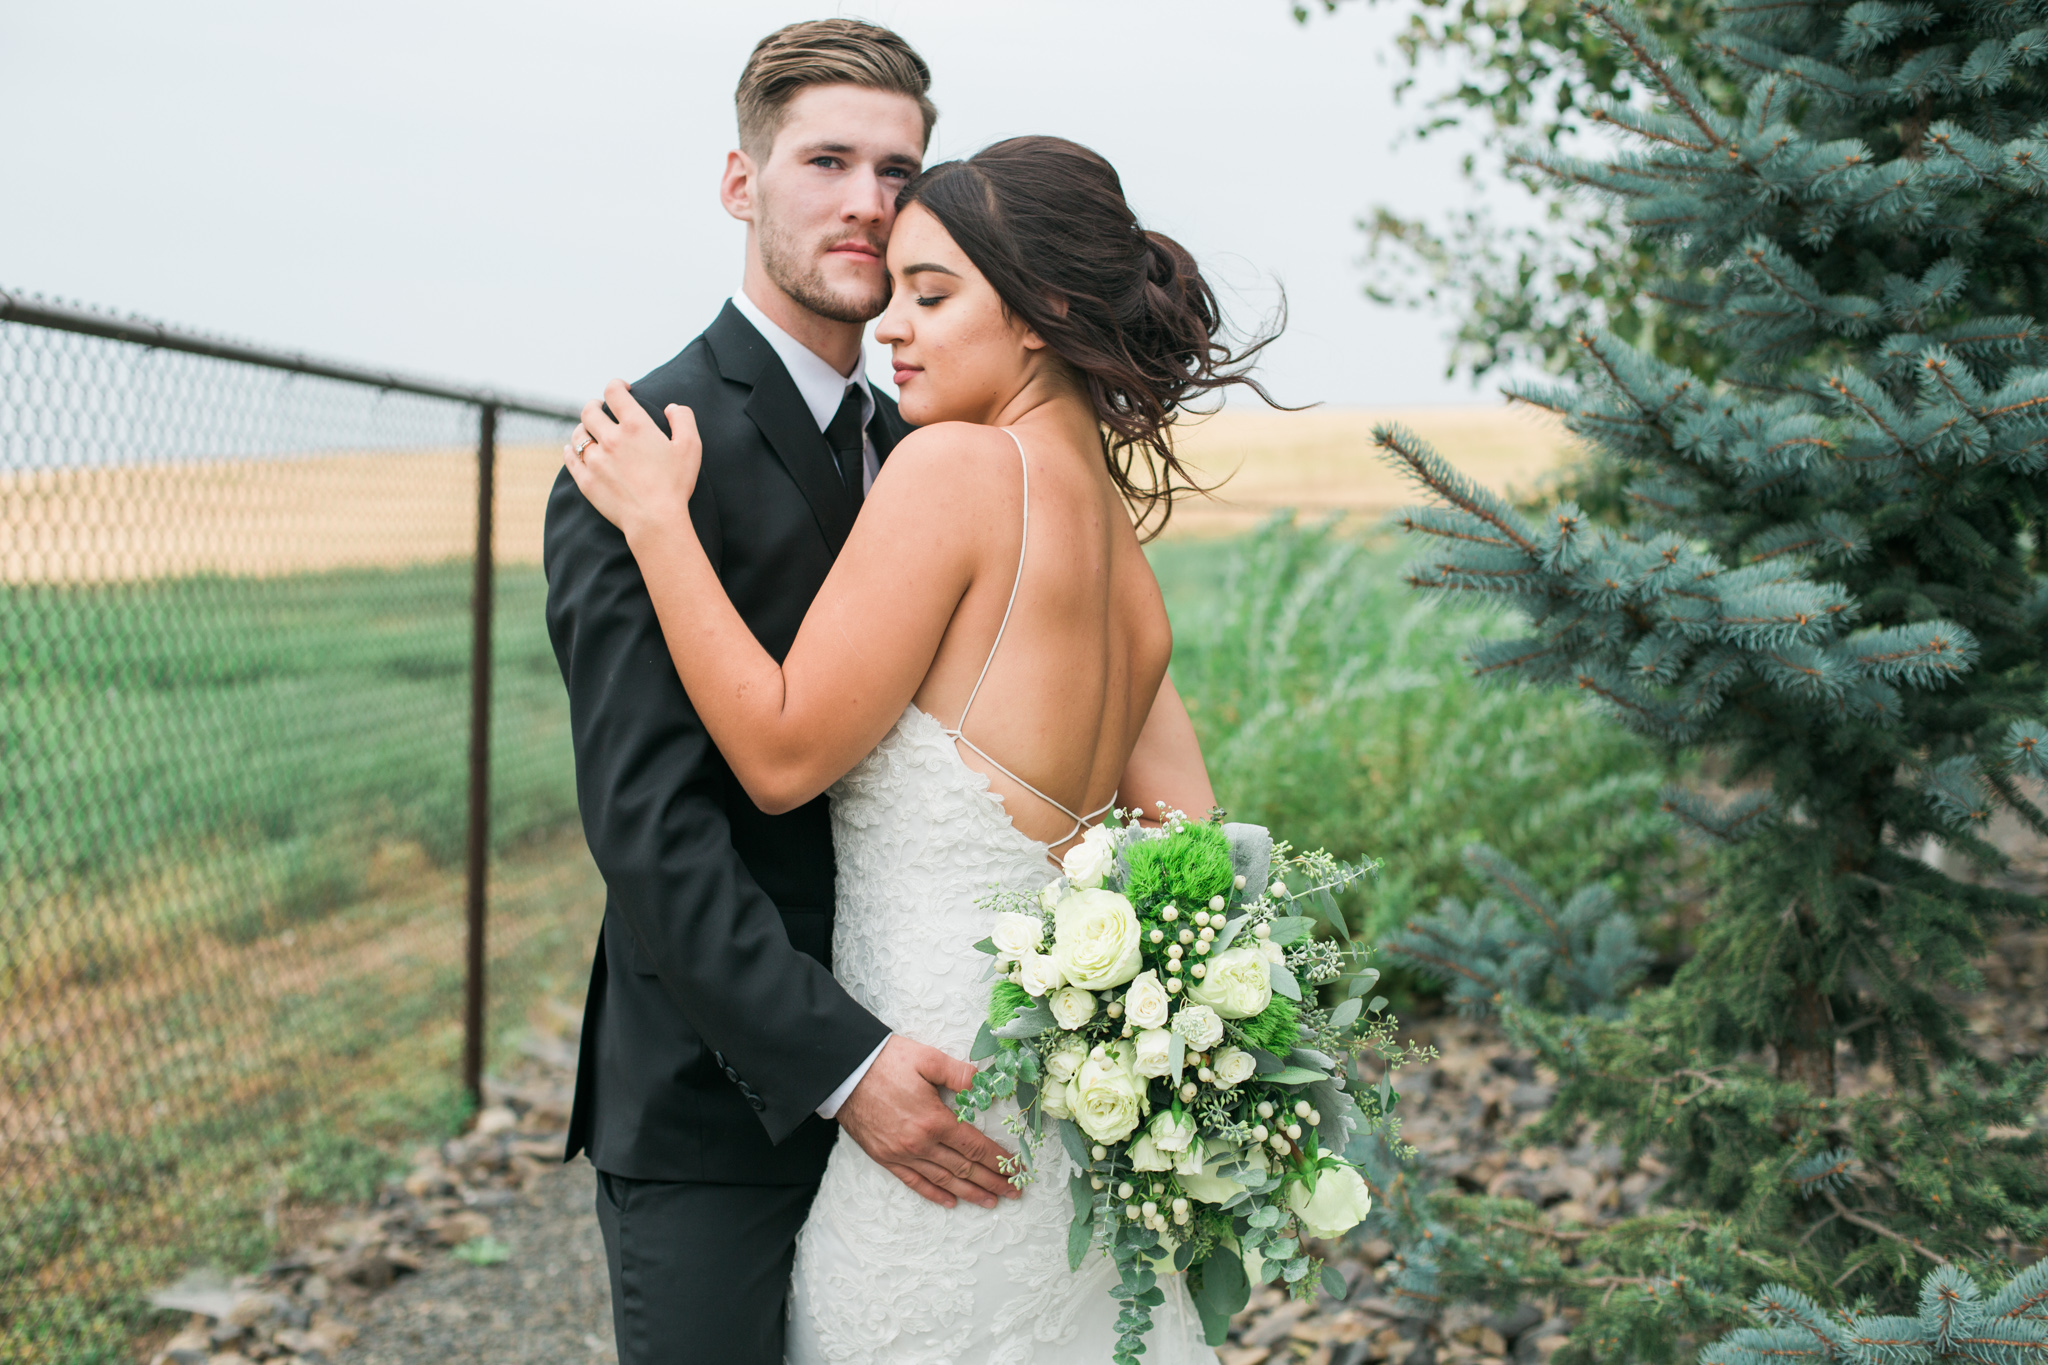 Olga_janni_wedding_090917_WEBSIZE (472 of 704).JPG